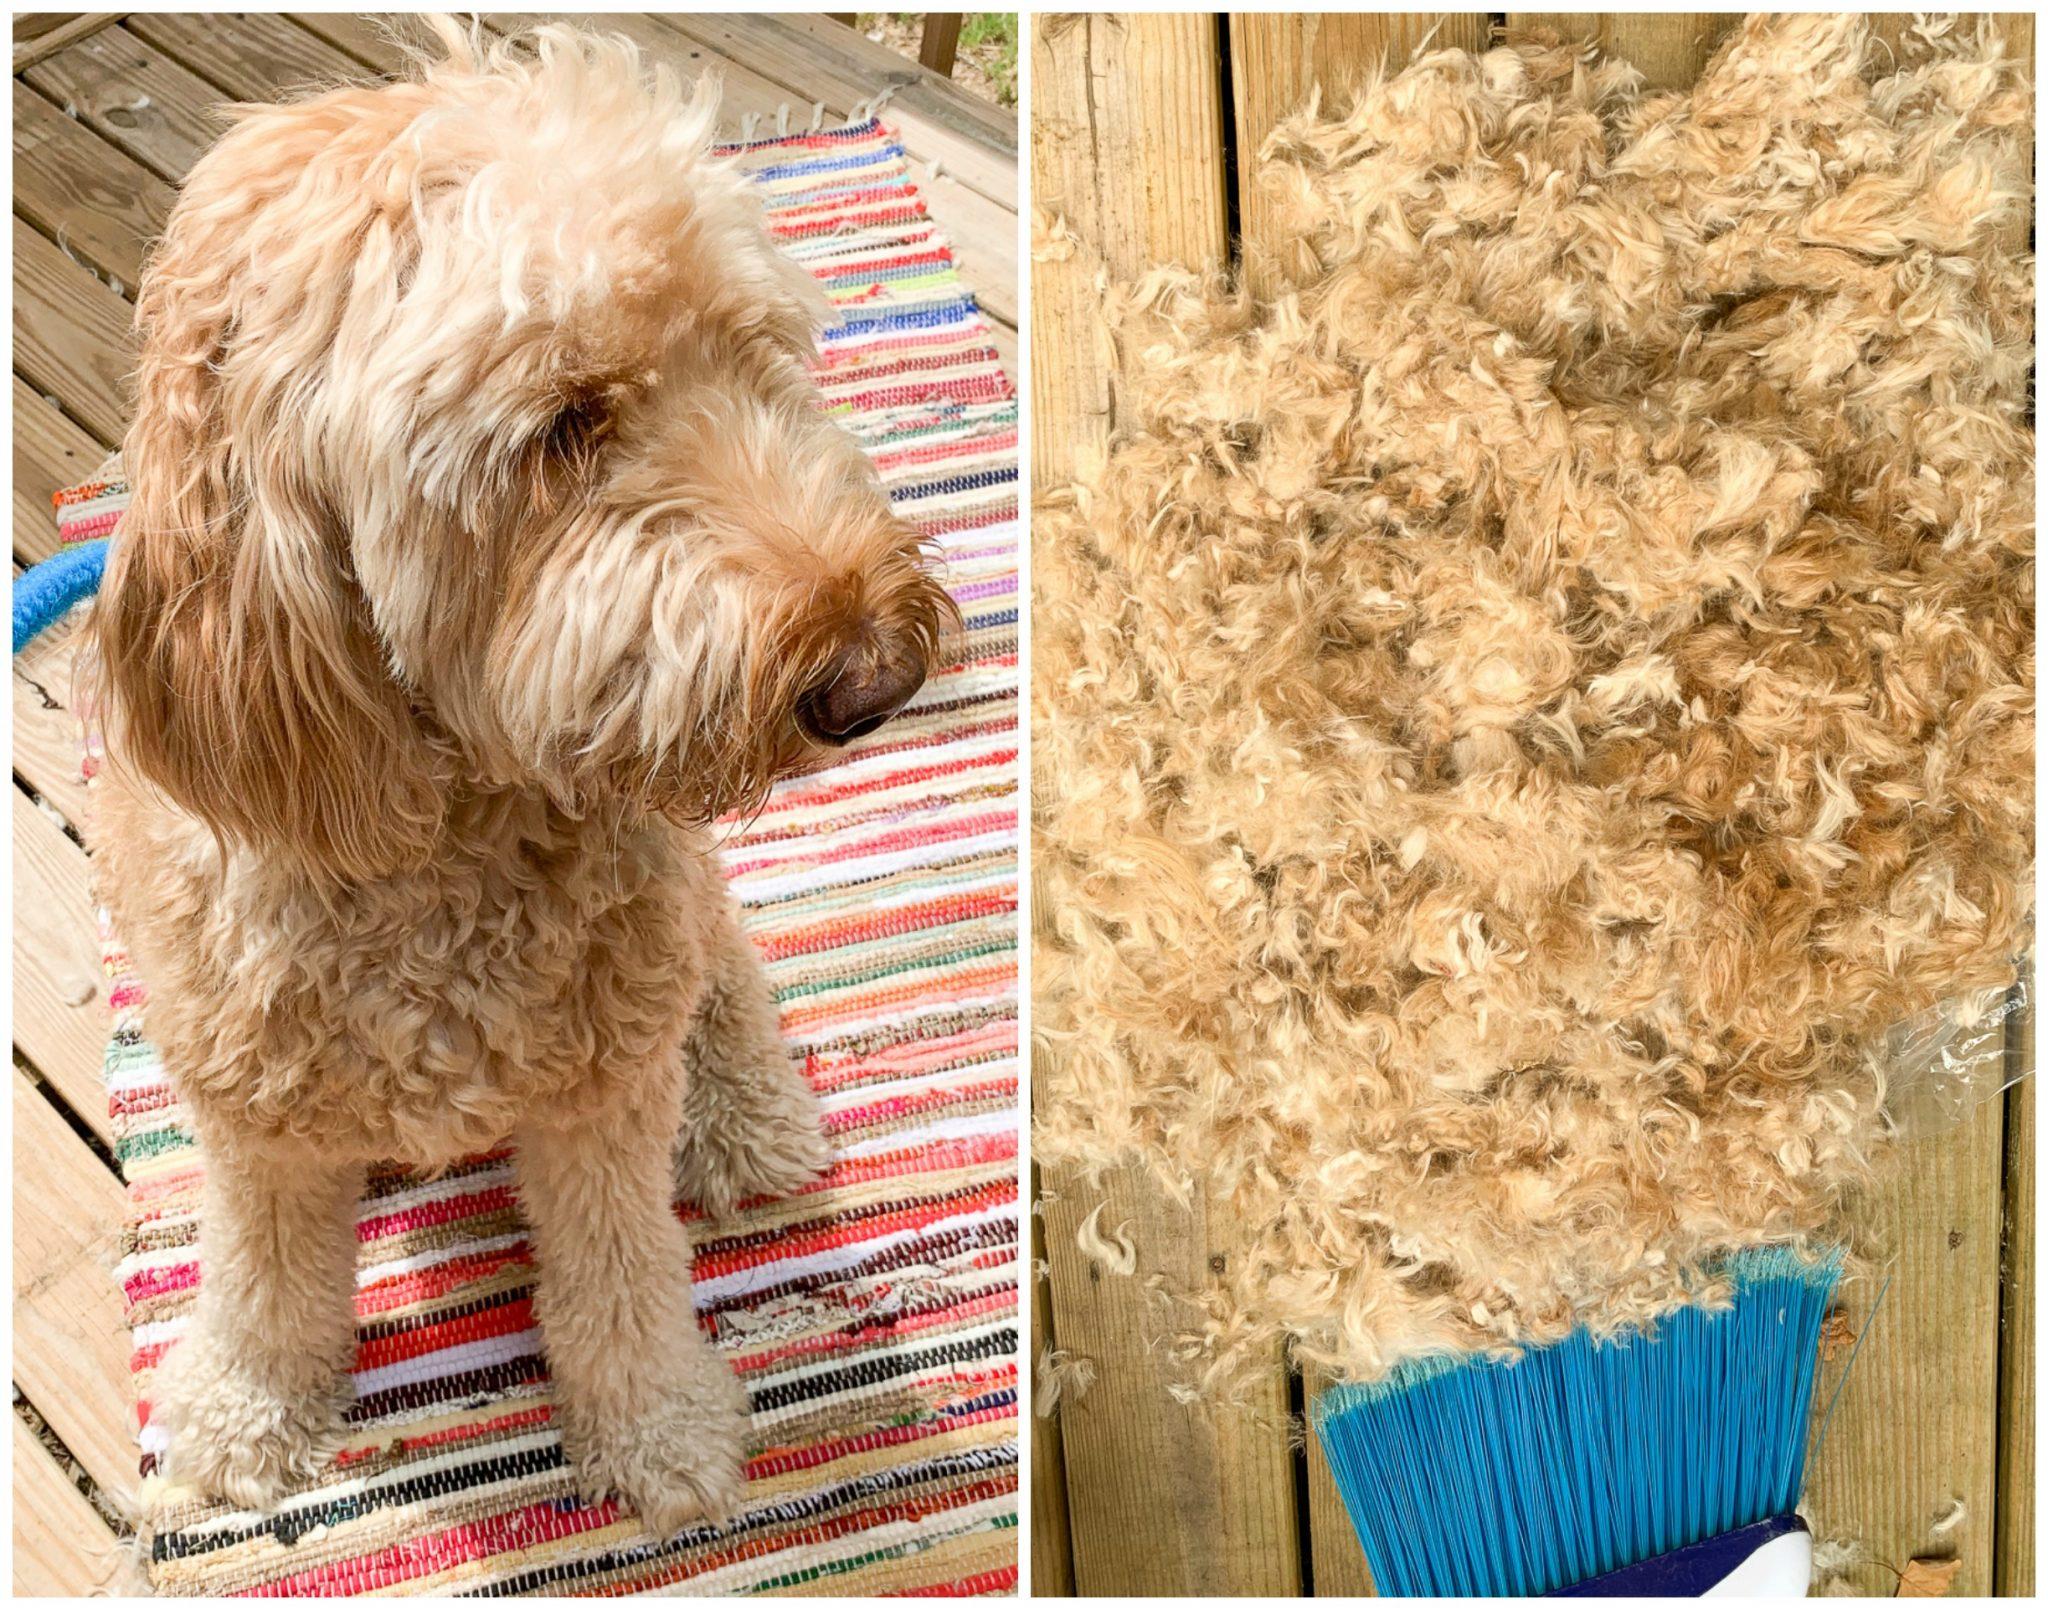 Grooming Dog Shaving Goldendoodle Dog Clipping Summer